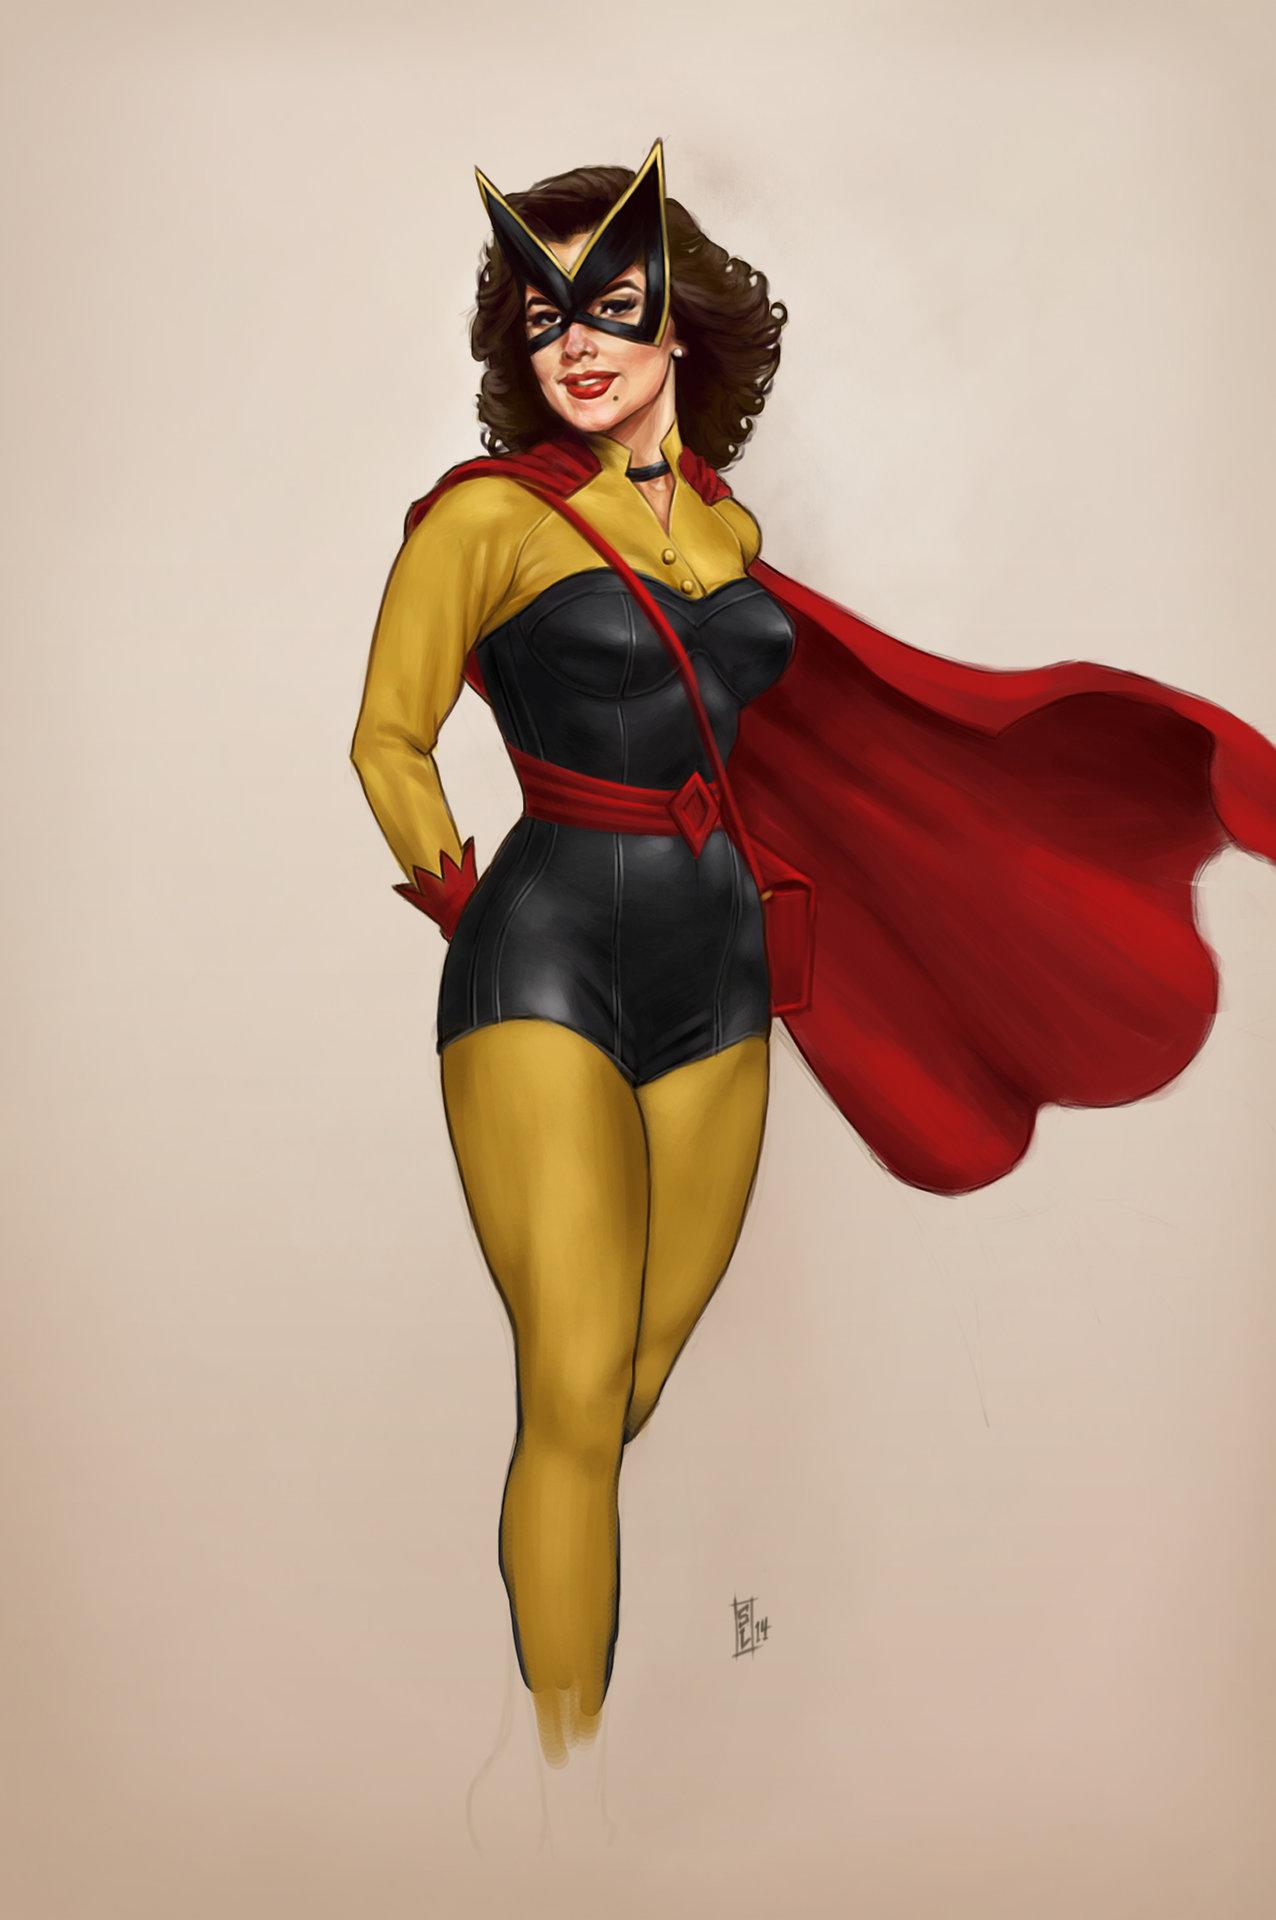 classy-female-superhero-pin-up-art-by-stephen-langmead2